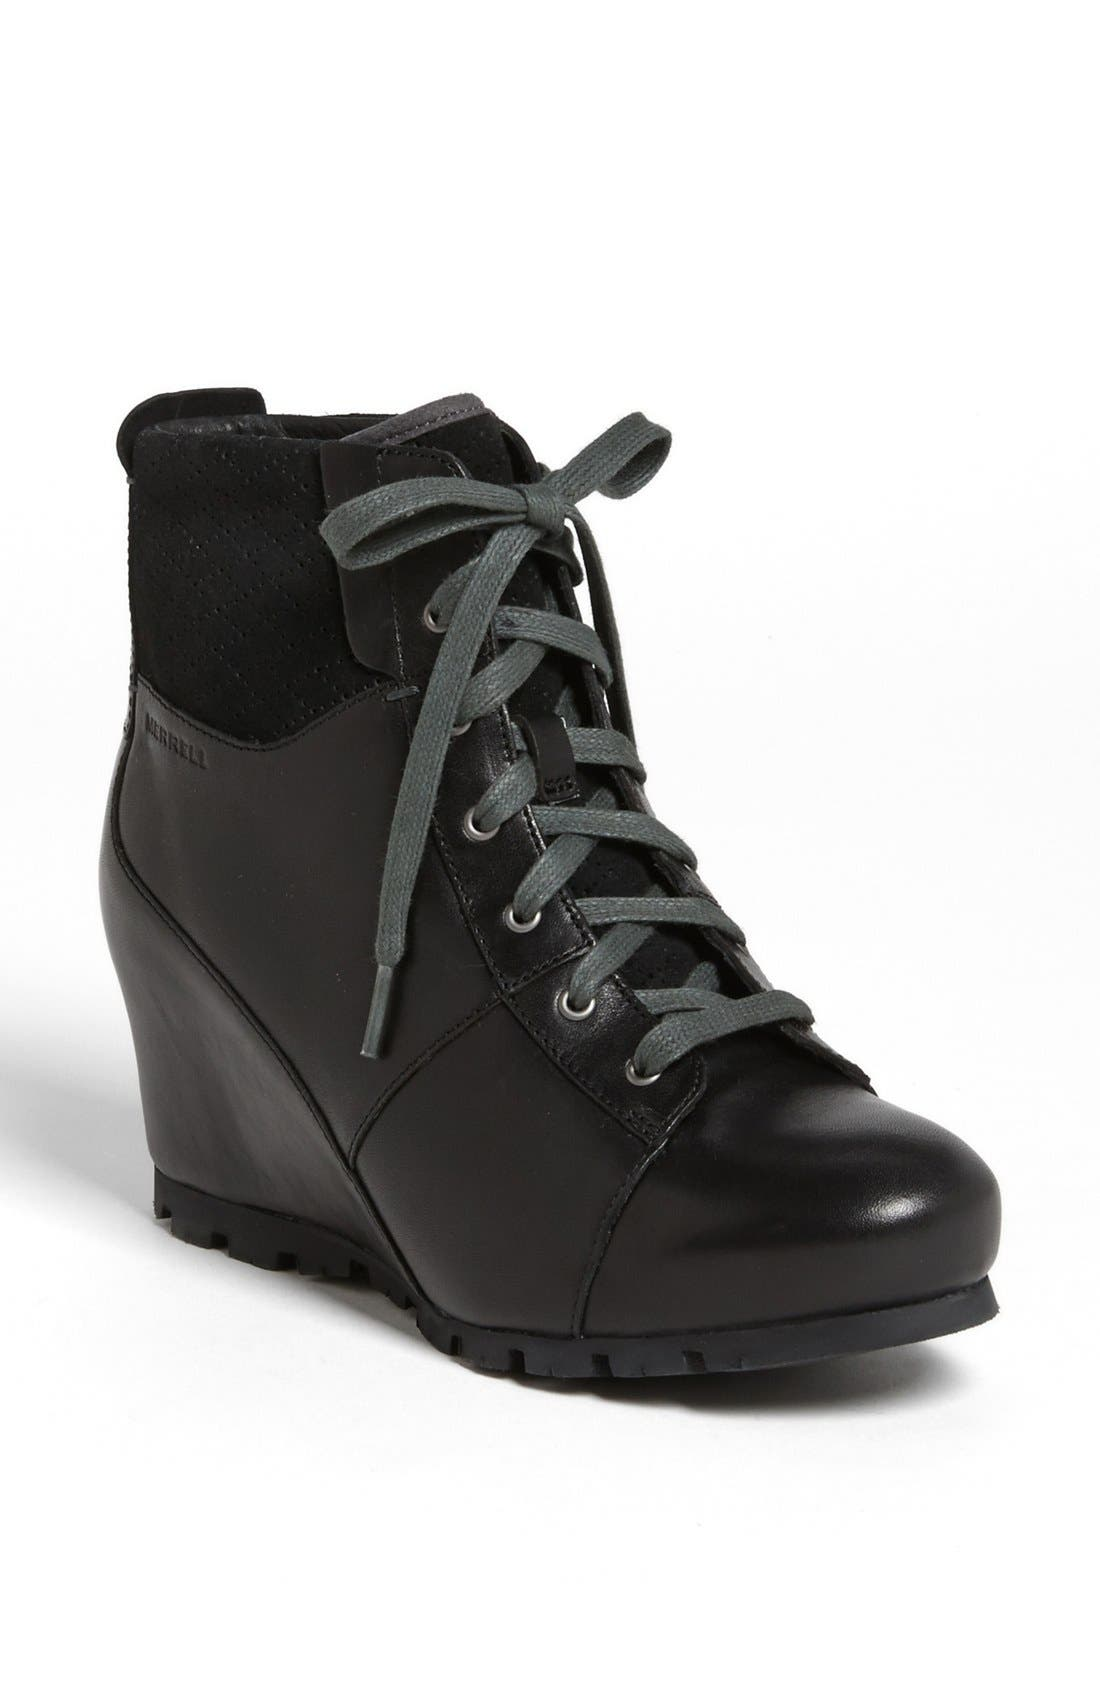 Alternate Image 1 Selected - Merrell 'Wedgetarian Lexi' Boot